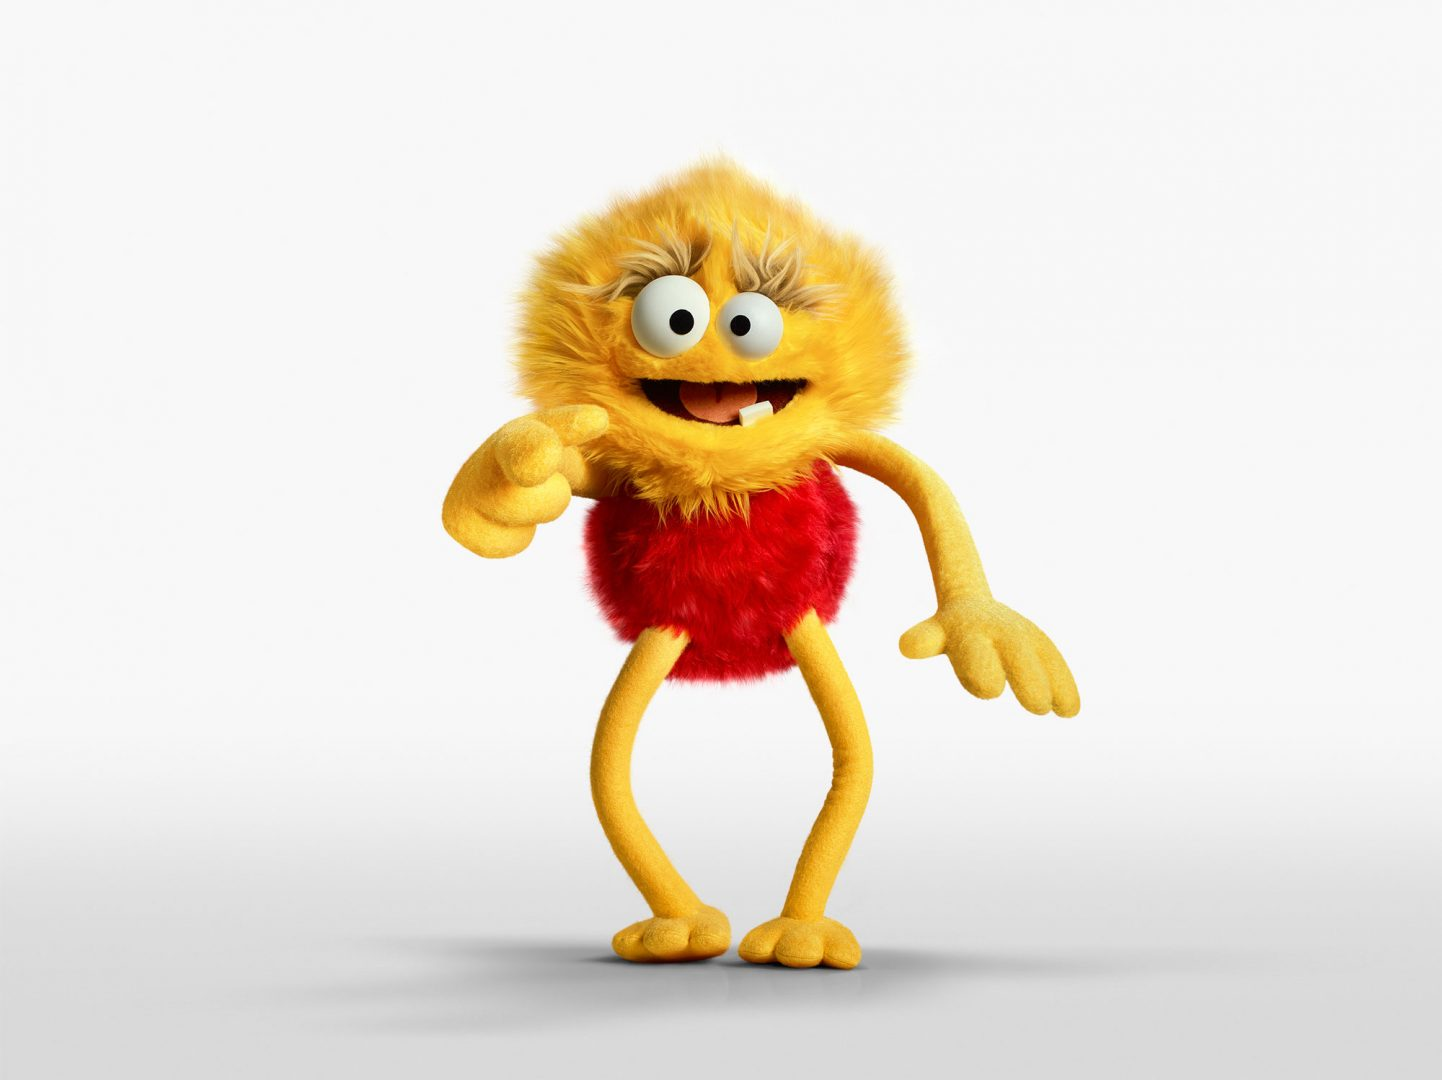 McDonalds-Character-Puppet Image